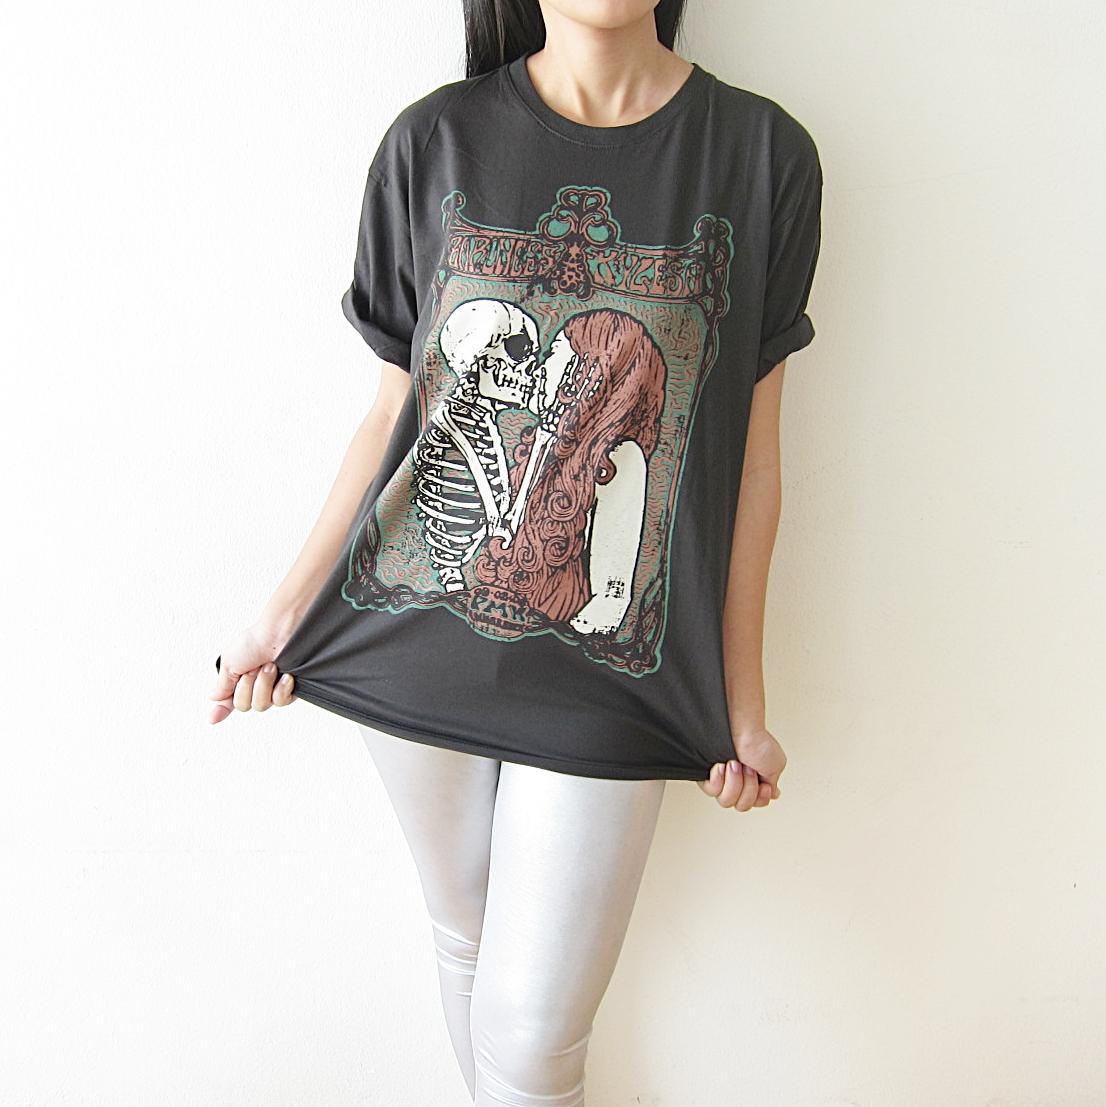 skull_kiss_girl_punk_rock_gothic_t_shirt_size_m_l_tees_4.JPG